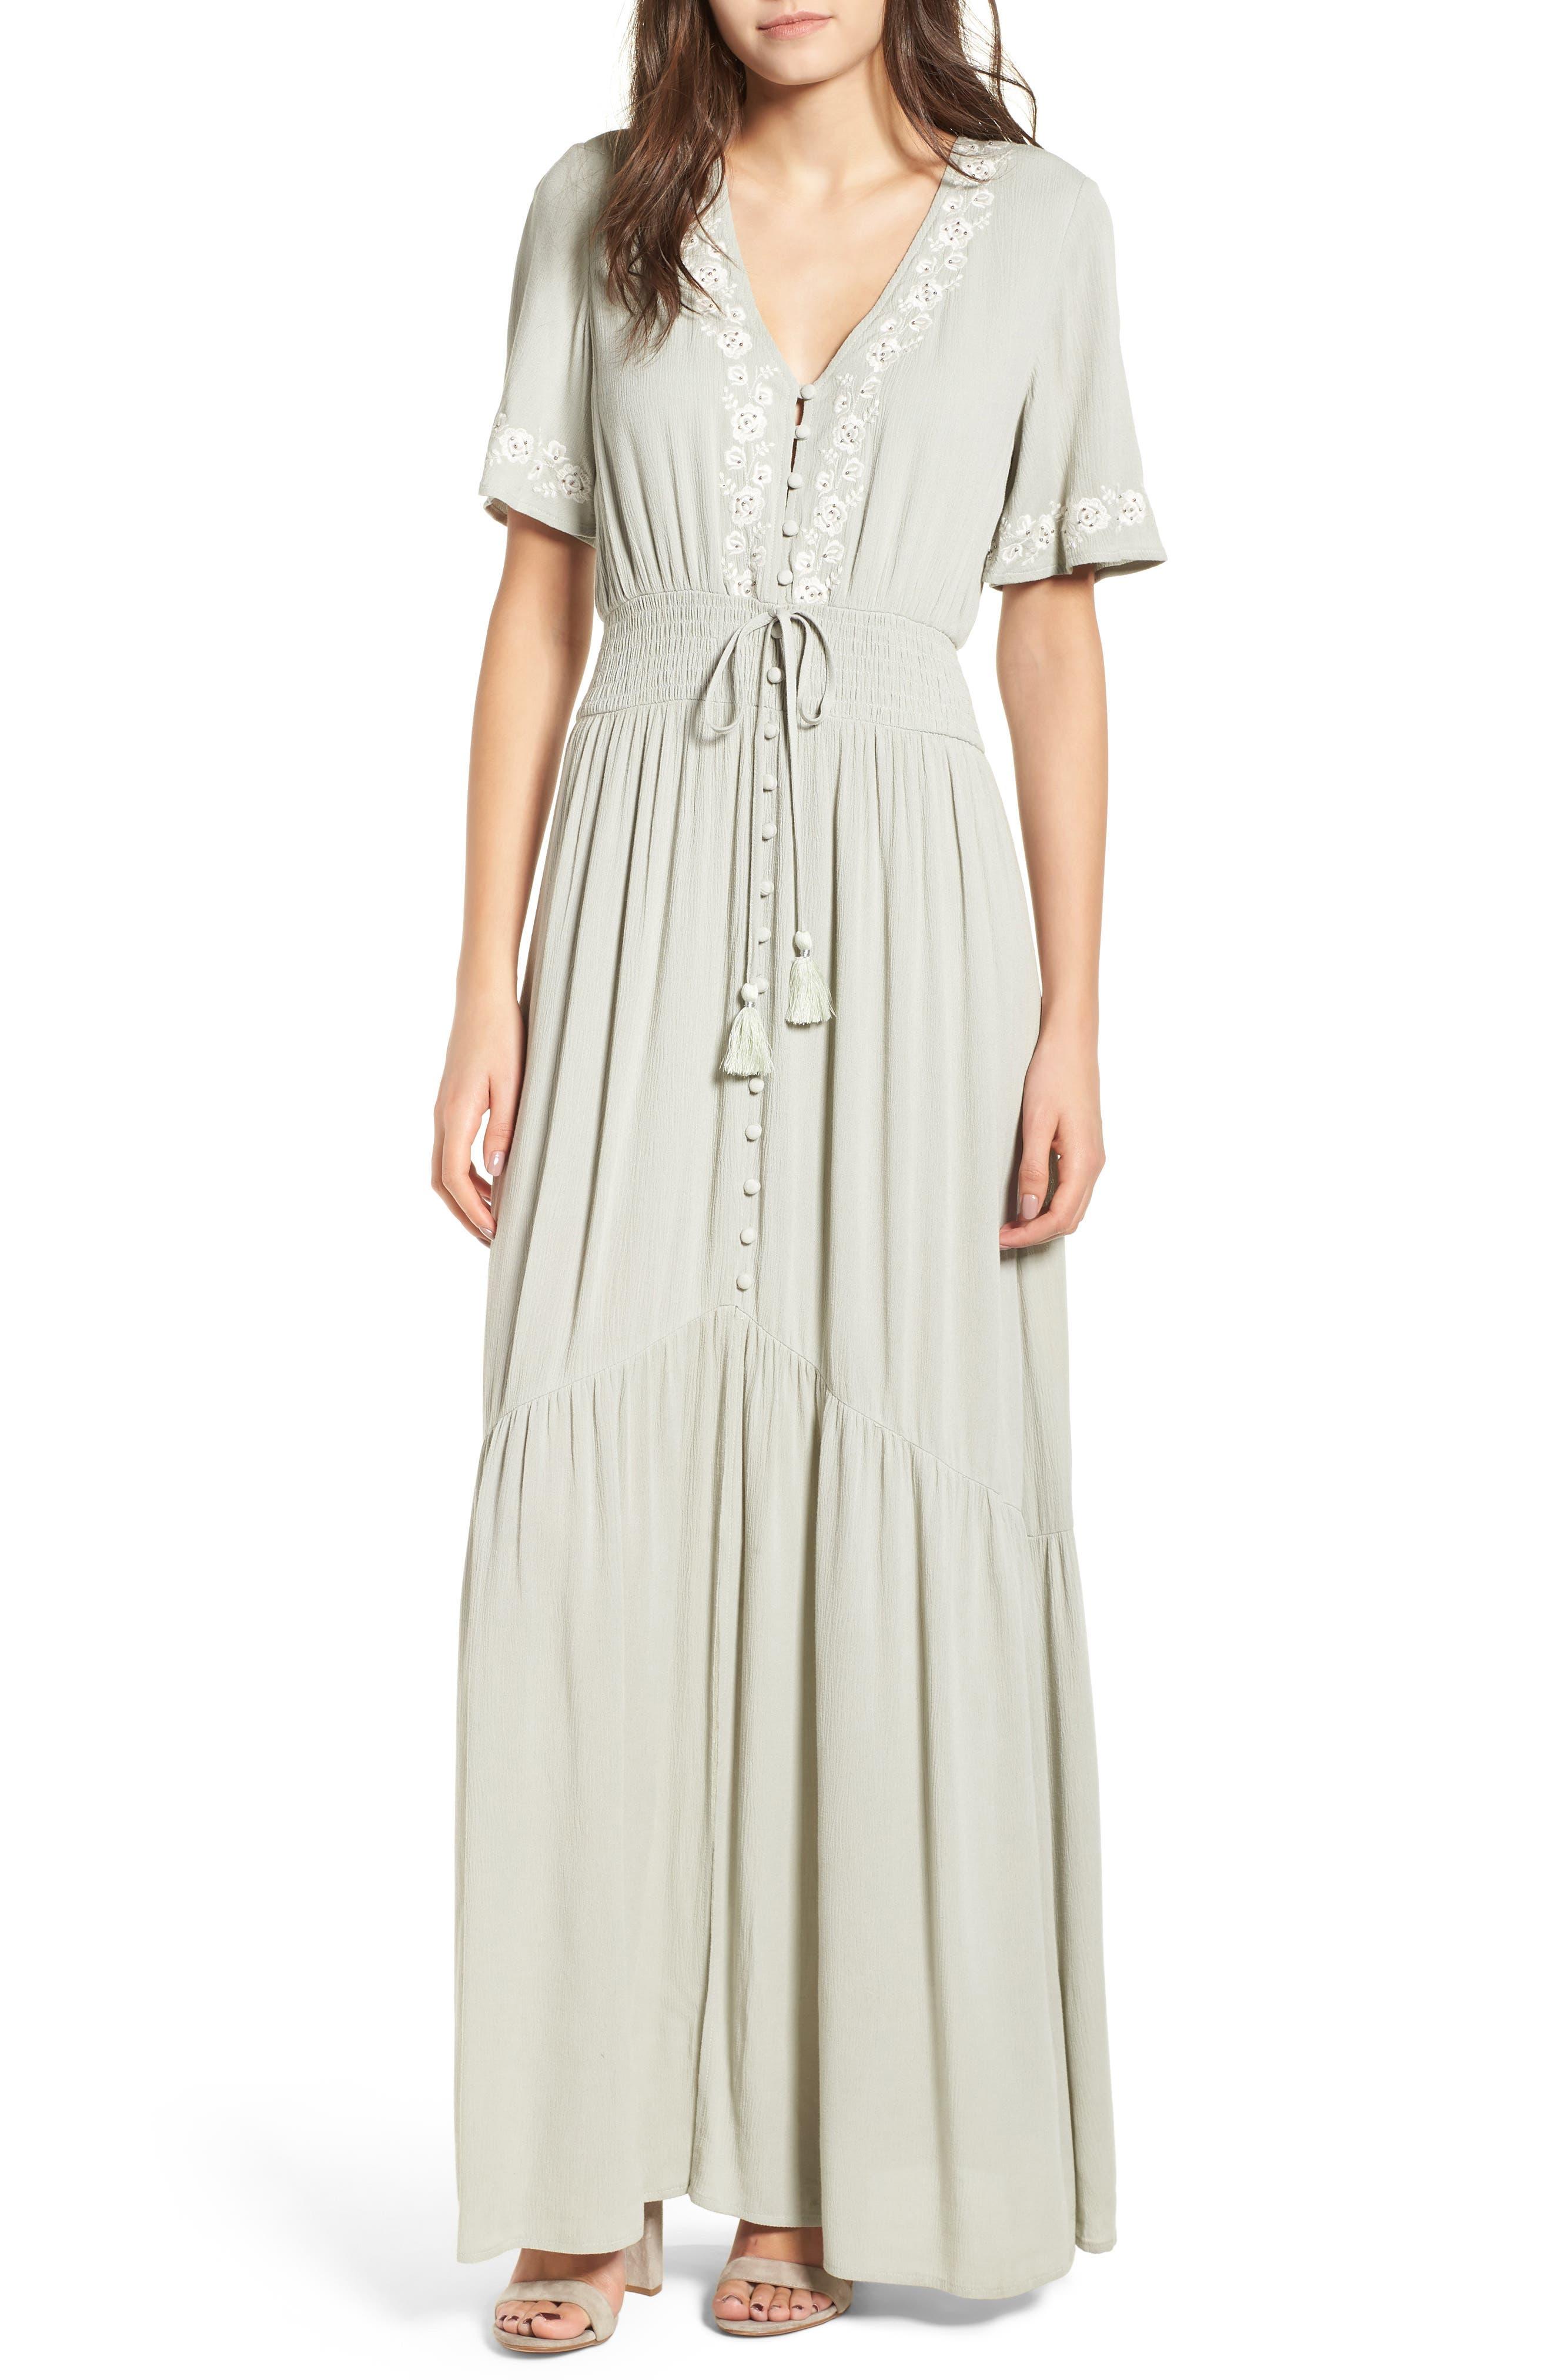 Athena Embroidered Maxi Dress,                             Main thumbnail 1, color,